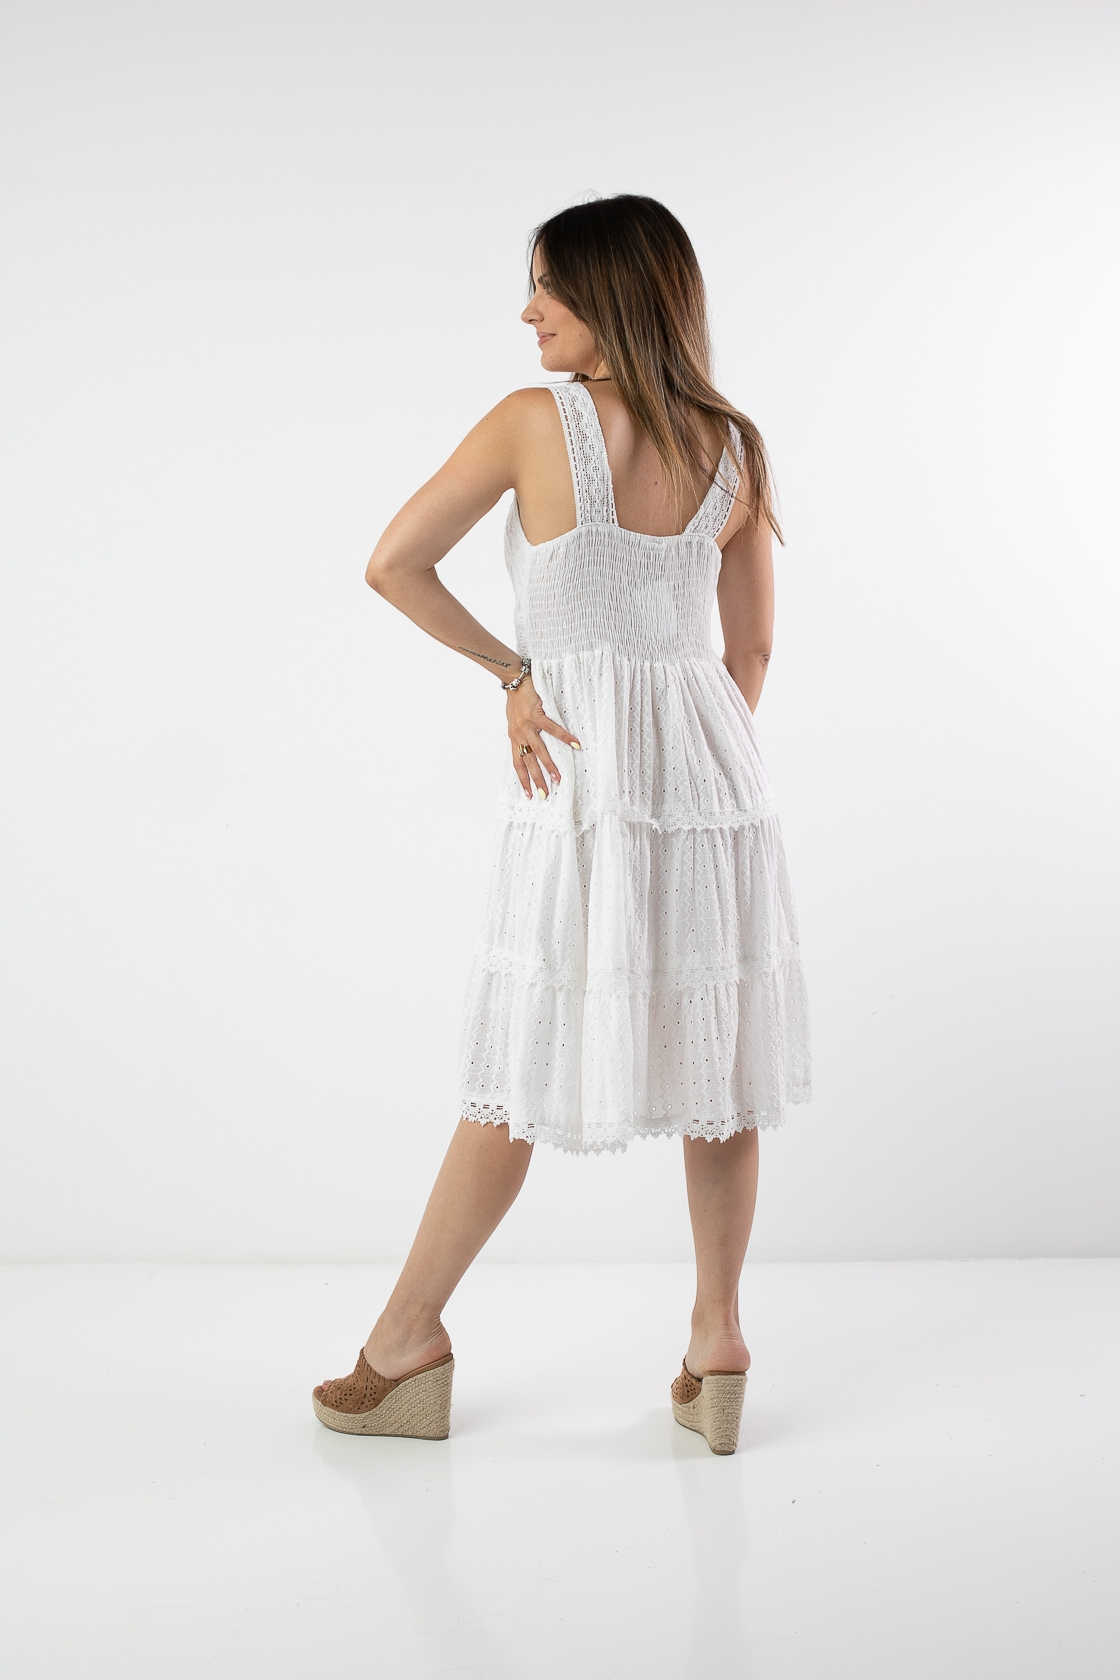 SATERI DRESS - WHITE